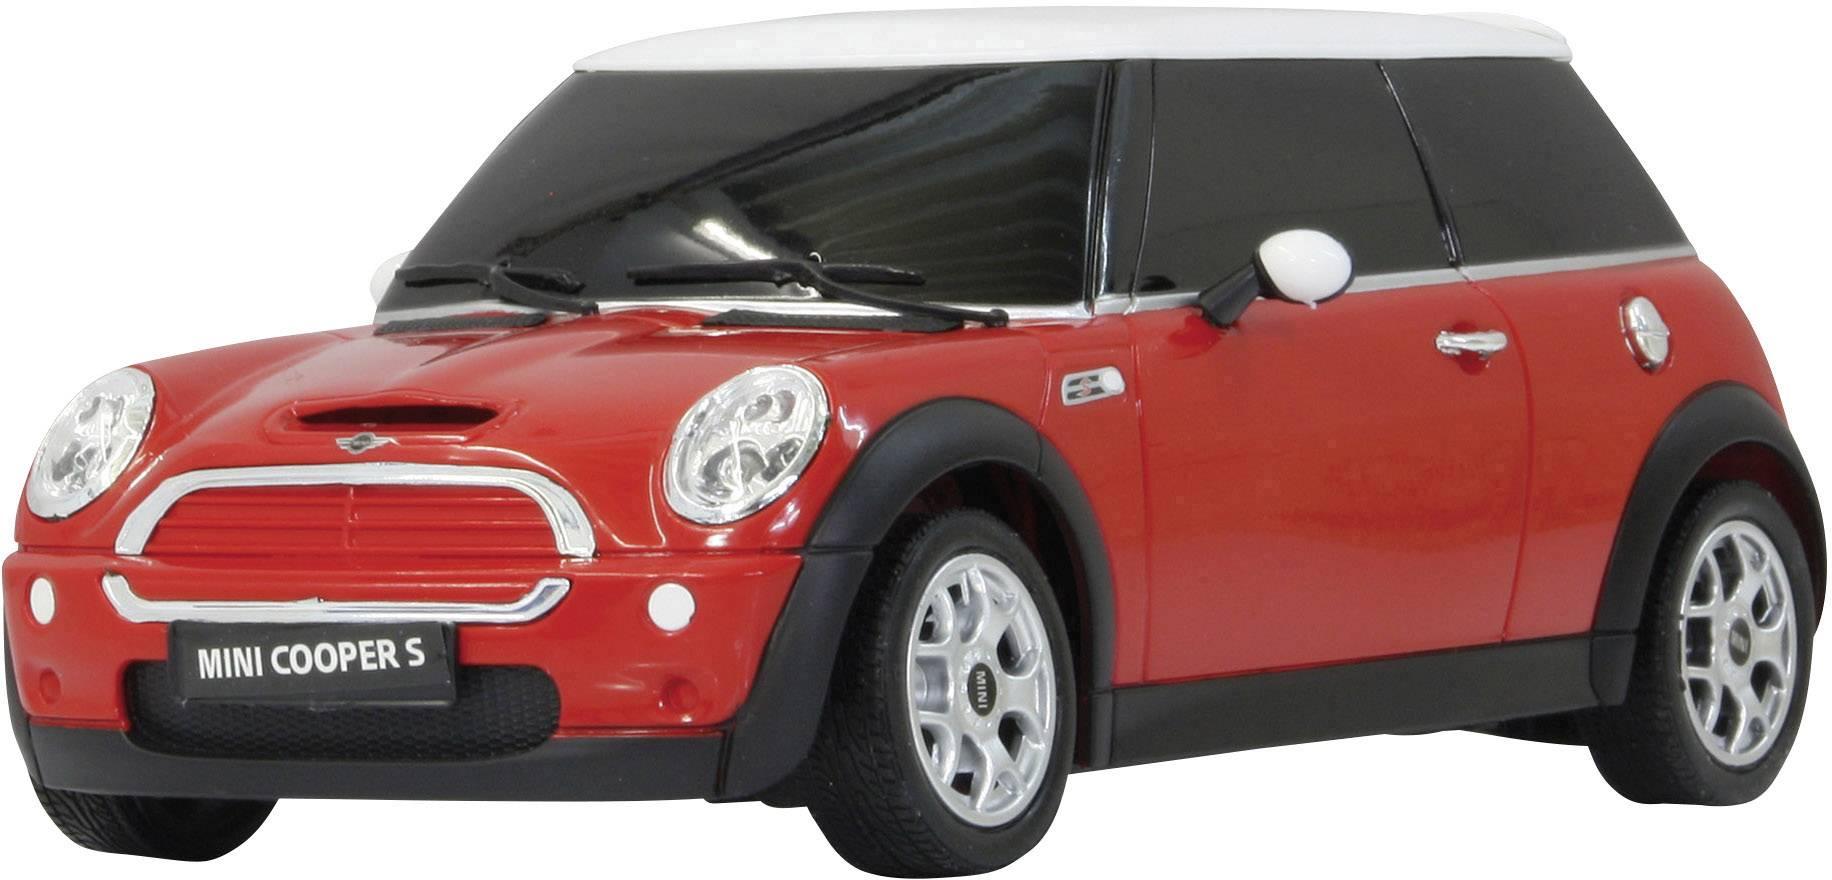 RC model auta Jamara 404035 – Mini Cooper S, červená, silniční vůz